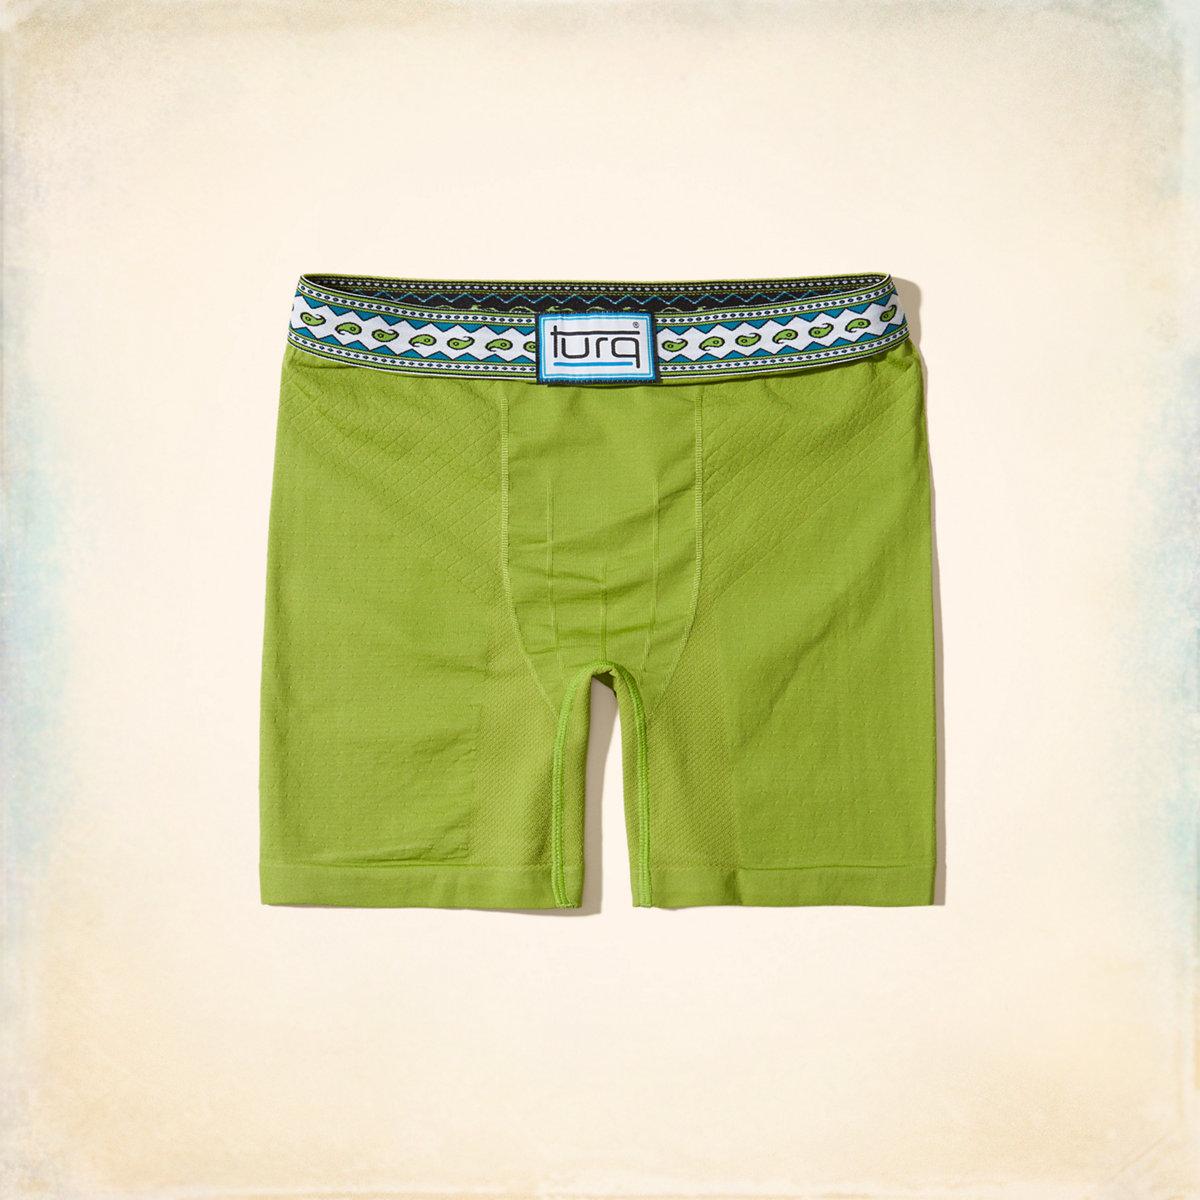 Turq Stoked Swim Underwear